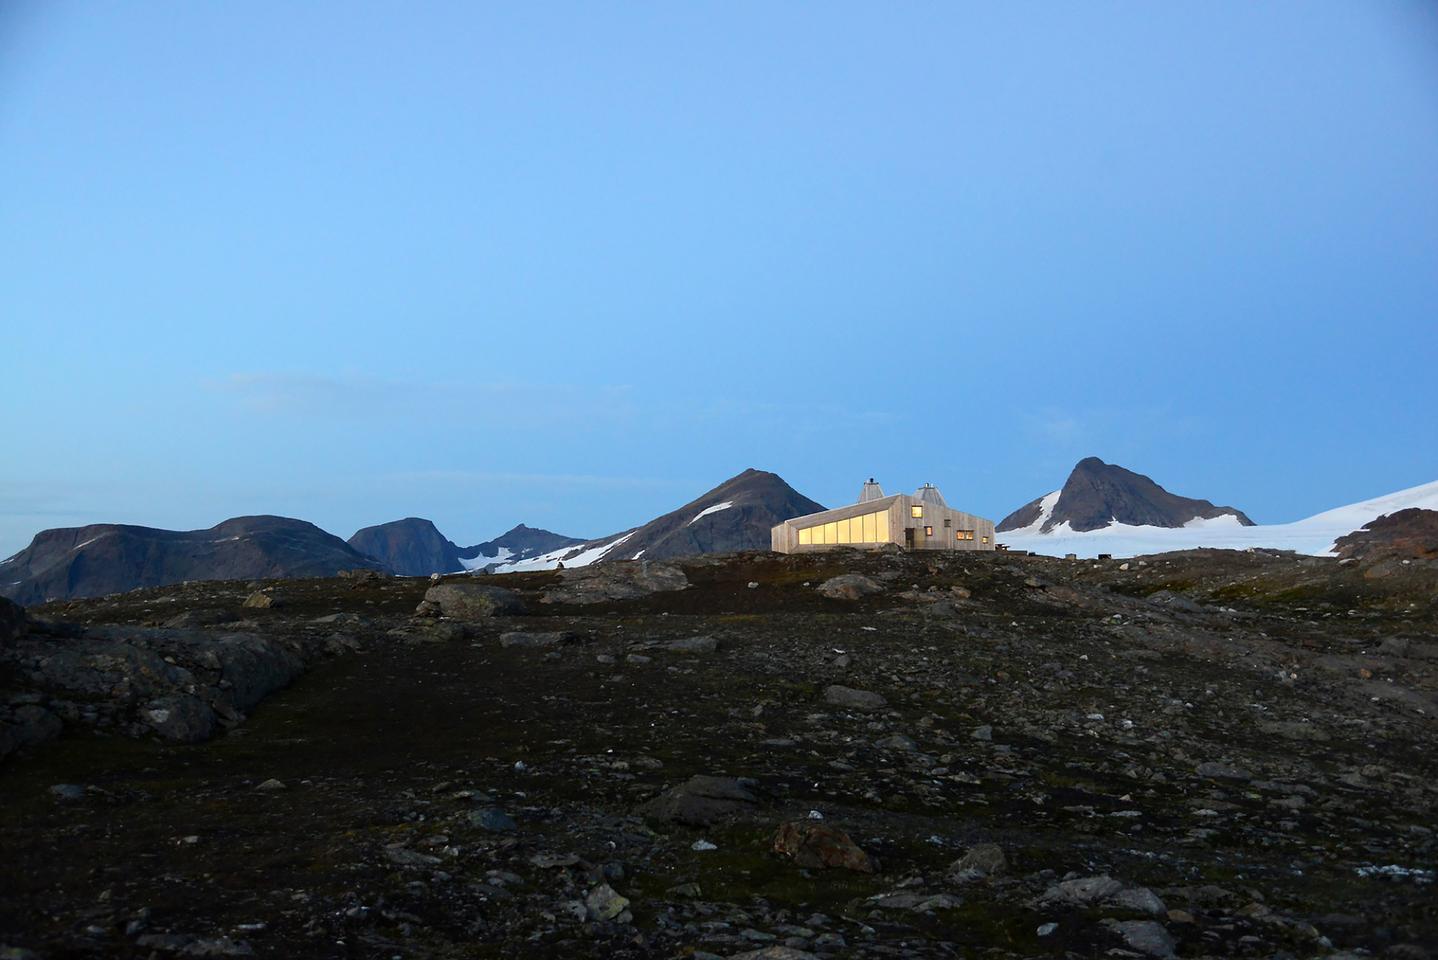 The Rabot Tourist Cabin is located 1,200 m (3,937 ft) above sea level in Norway's Okstindan mountain range (Photo: Svein Arne Brygfjeld)